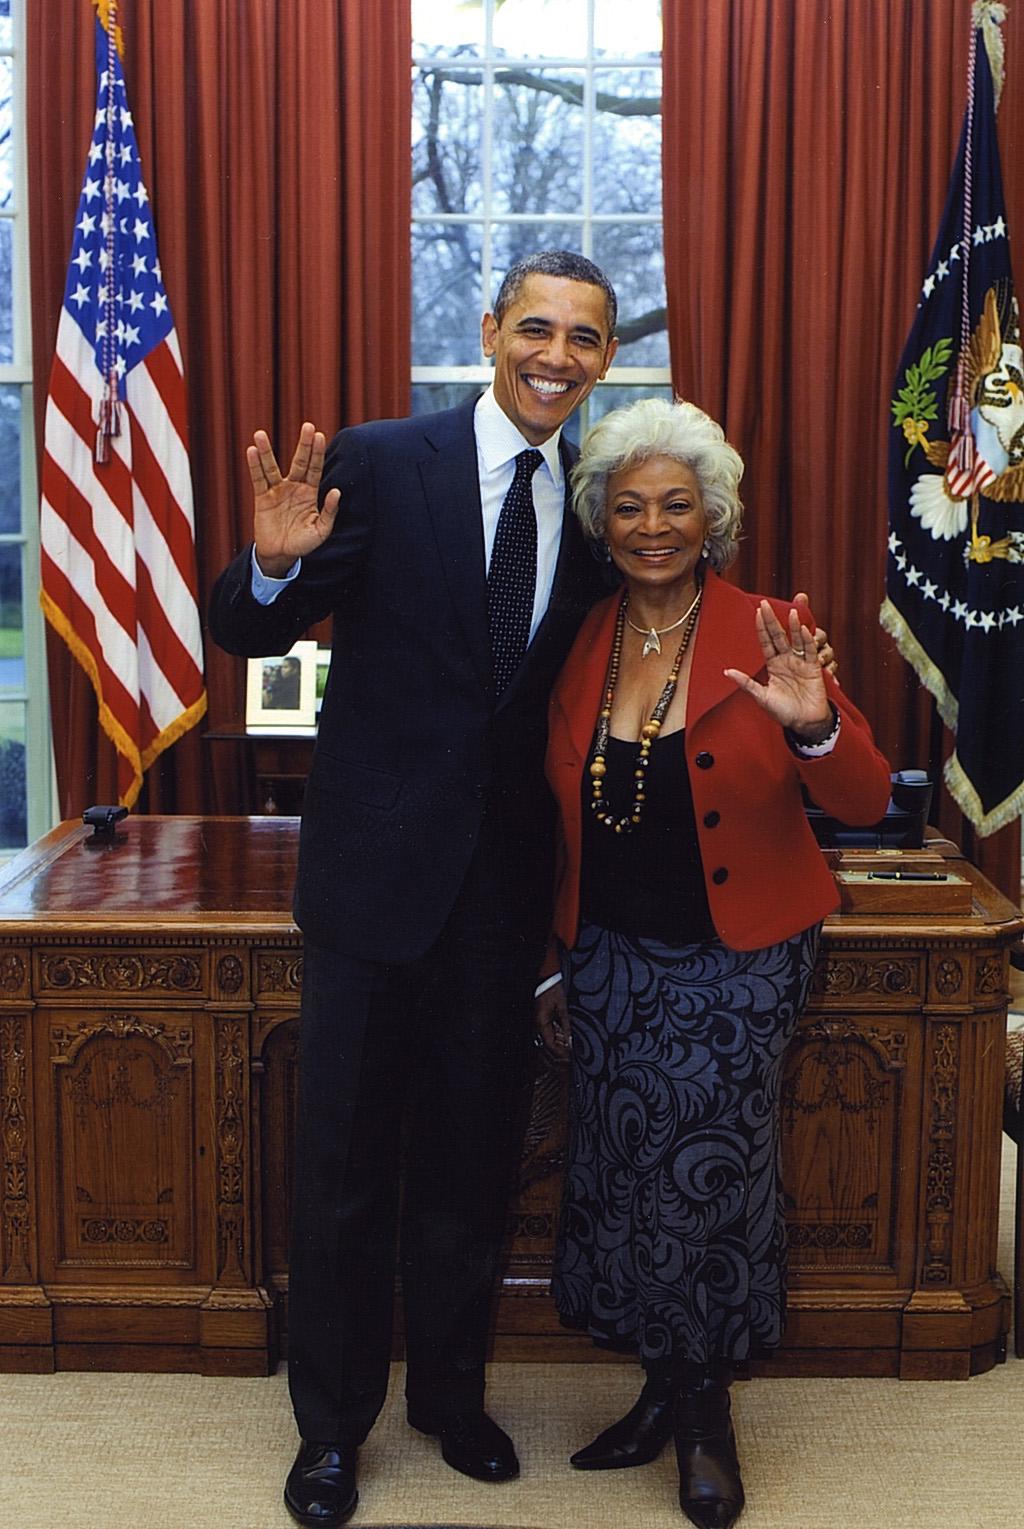 President Obama & Nichelle Nichols at the White House do the Vulcan Salute